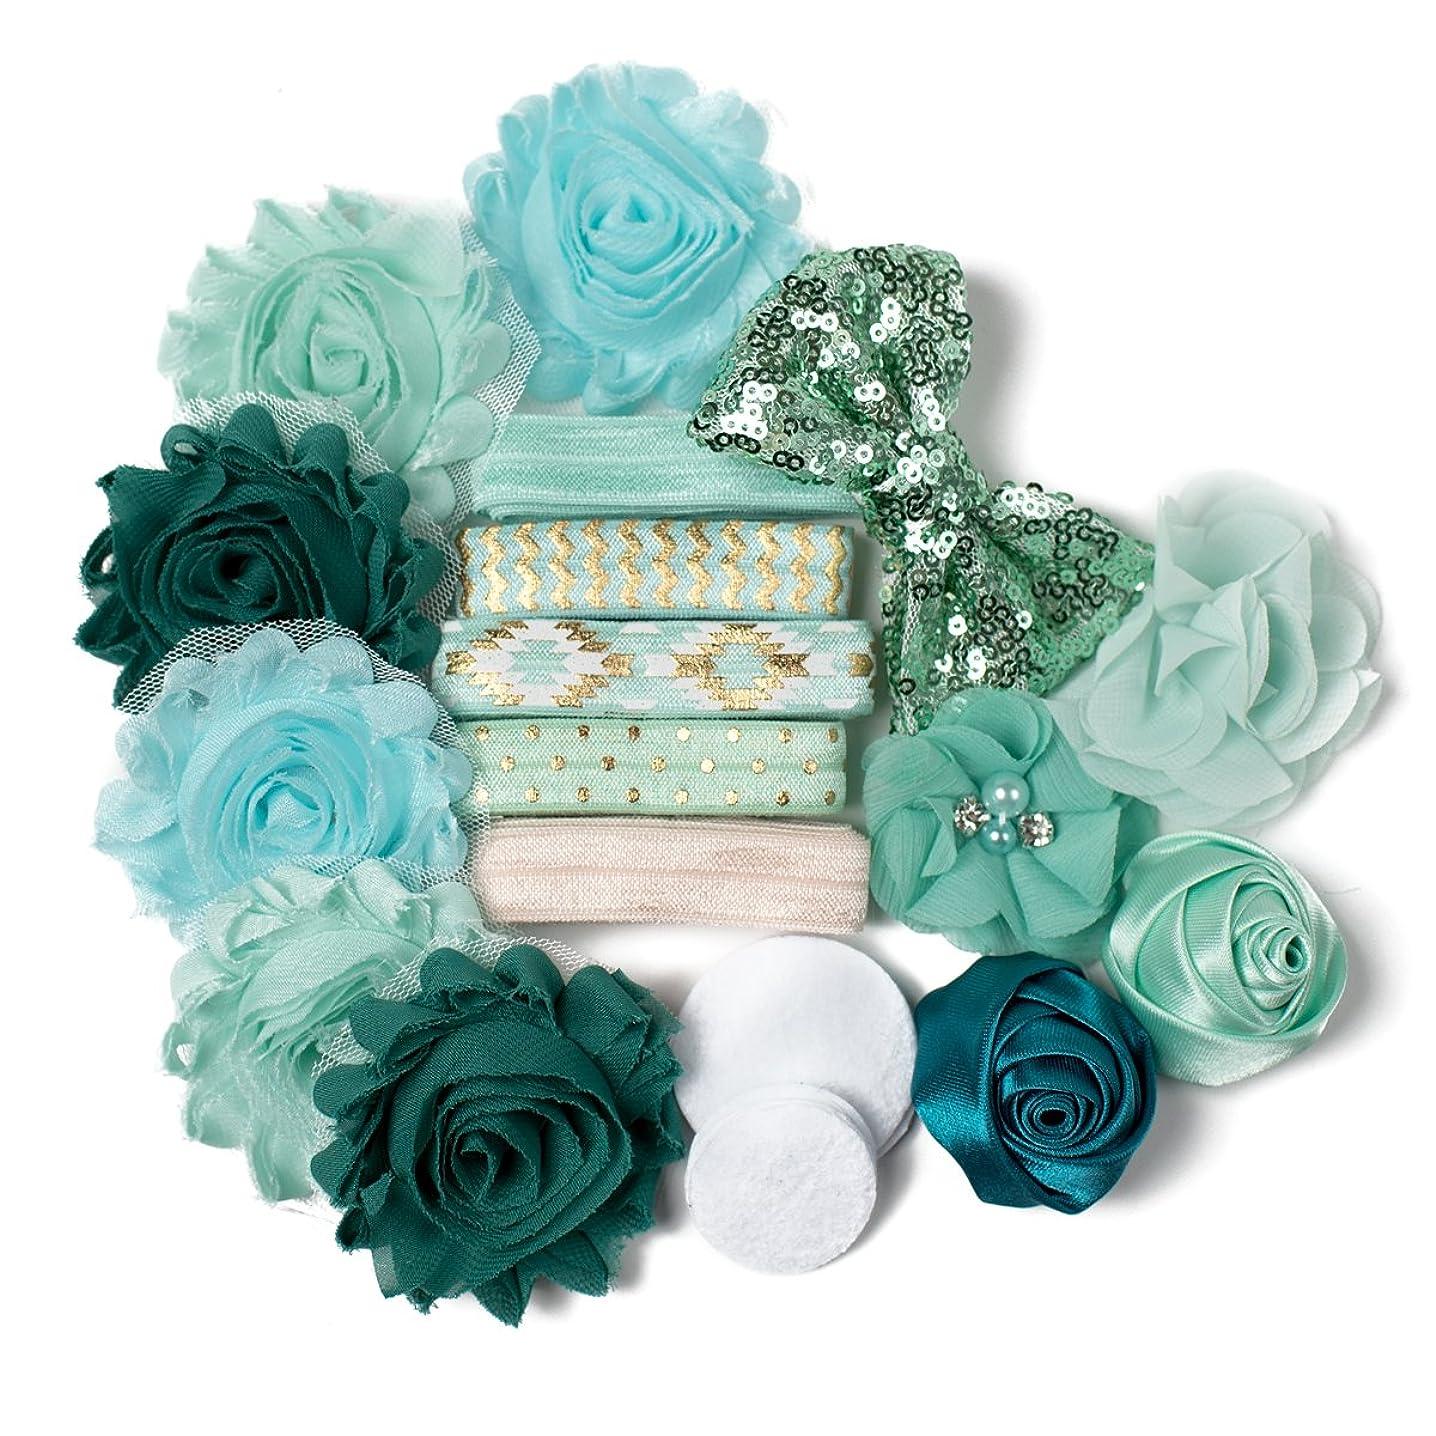 Mint Green with Envy : DIY Deluxe Mini Headband Kit Makes 5-10 Headband Hair Accessories : Shabby Chiffon Craft Roses FOE Fold Over Elastic : Teal Aqua Princess Parties & Baby Showers